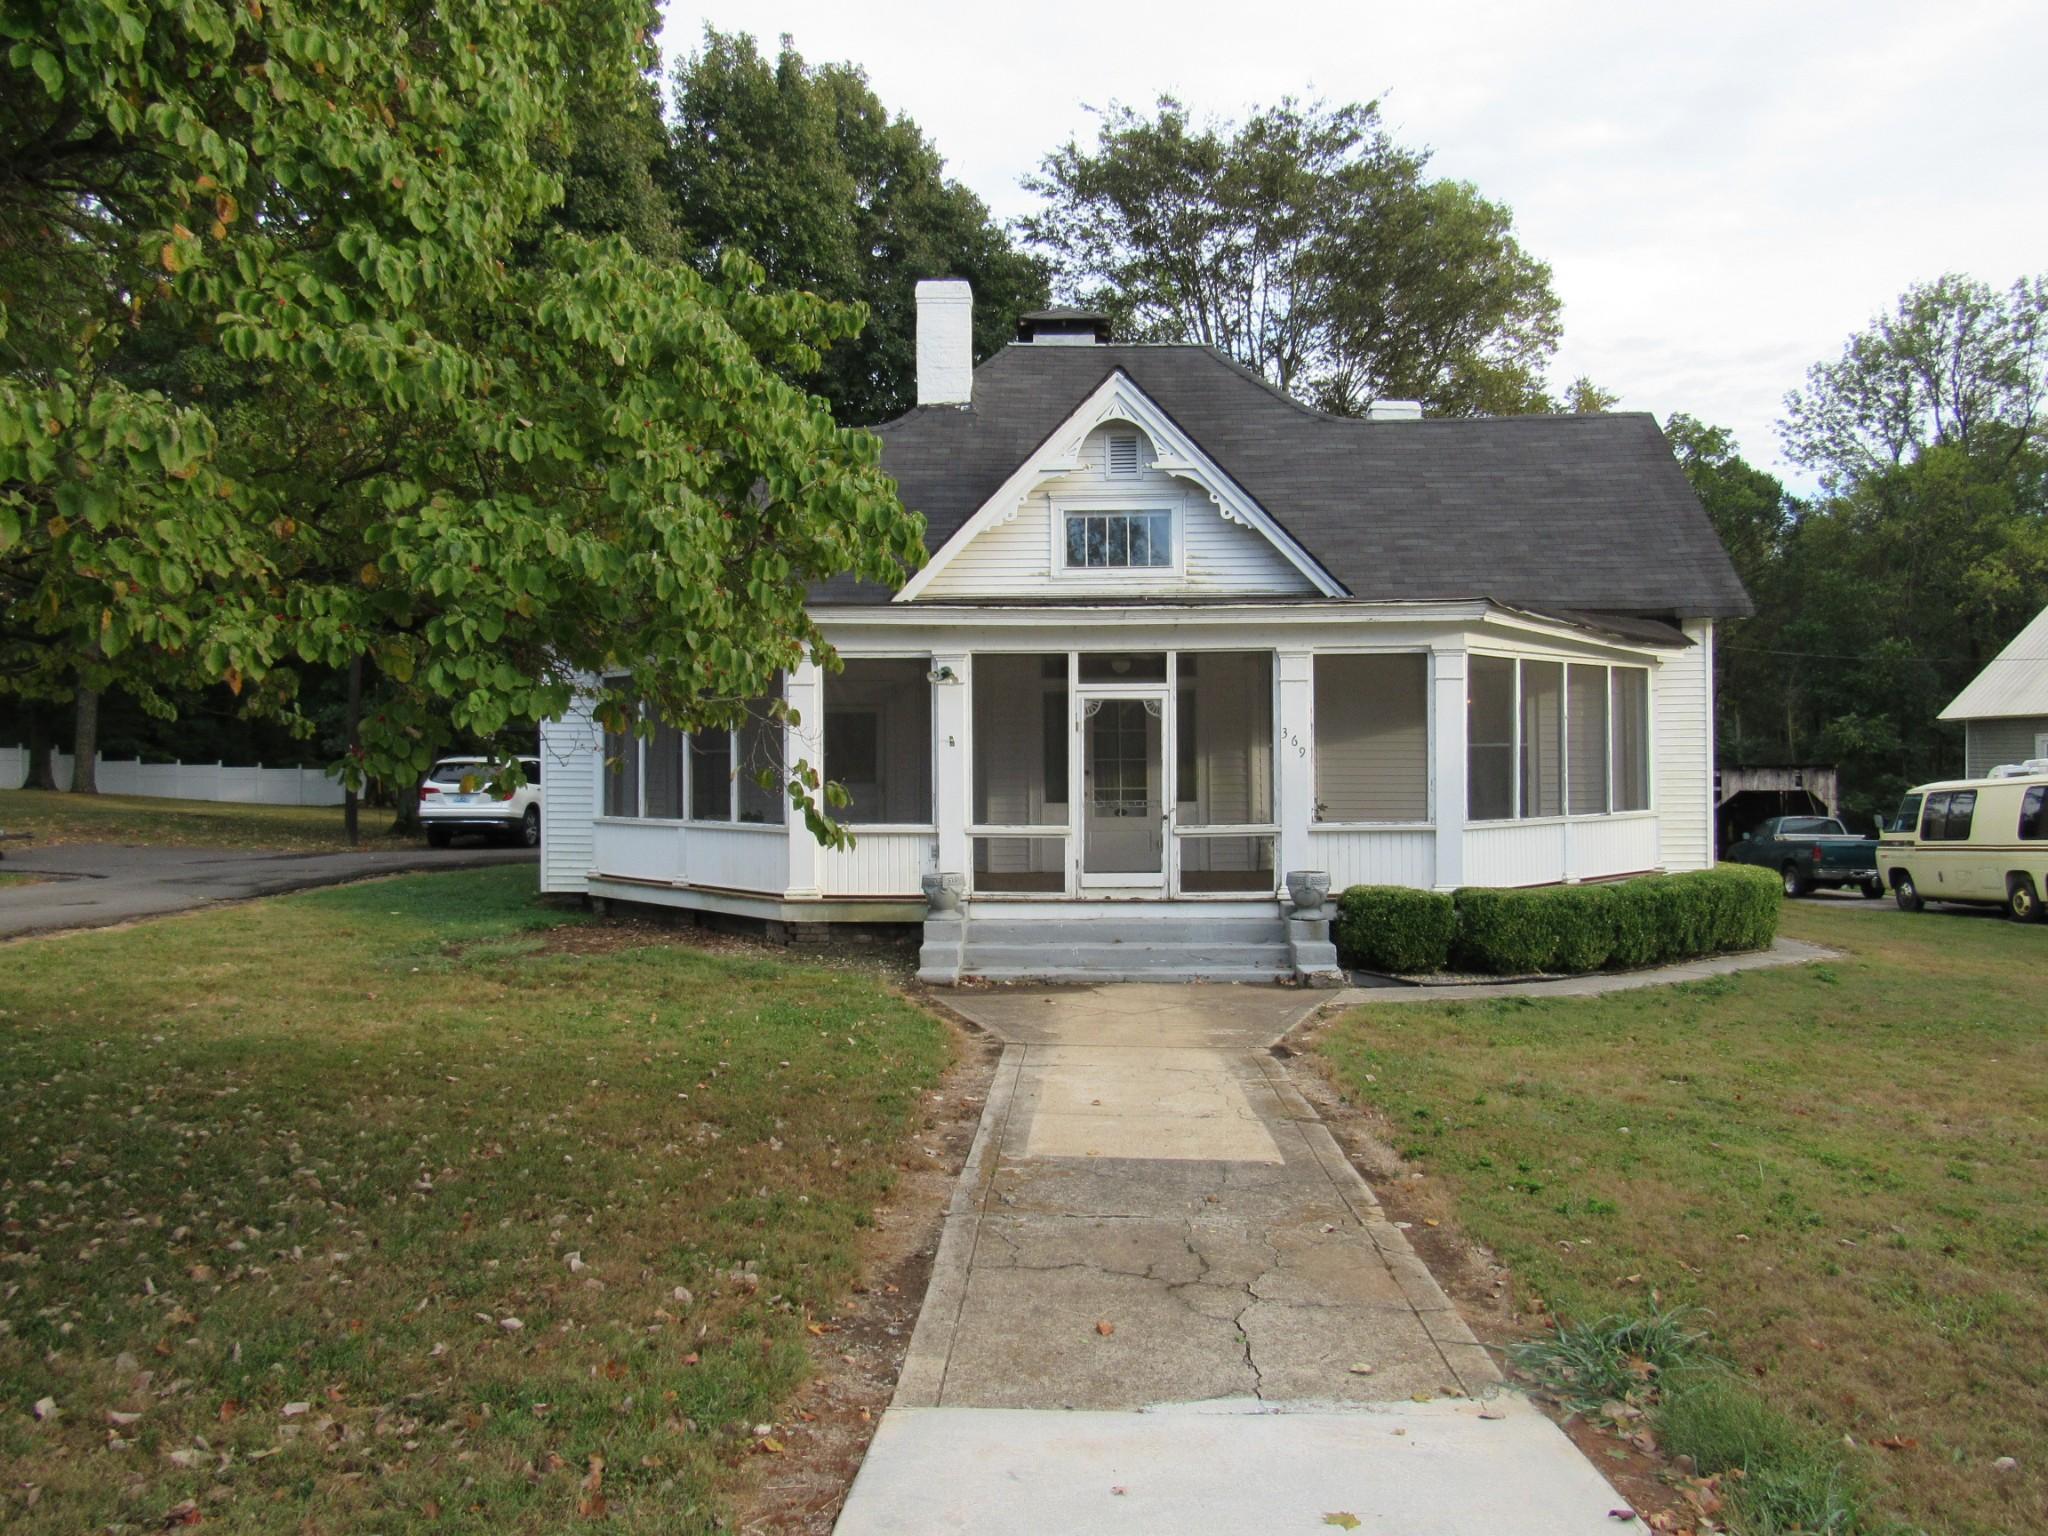 369 E Park St, Guthrie, KY 42234 - Guthrie, KY real estate listing